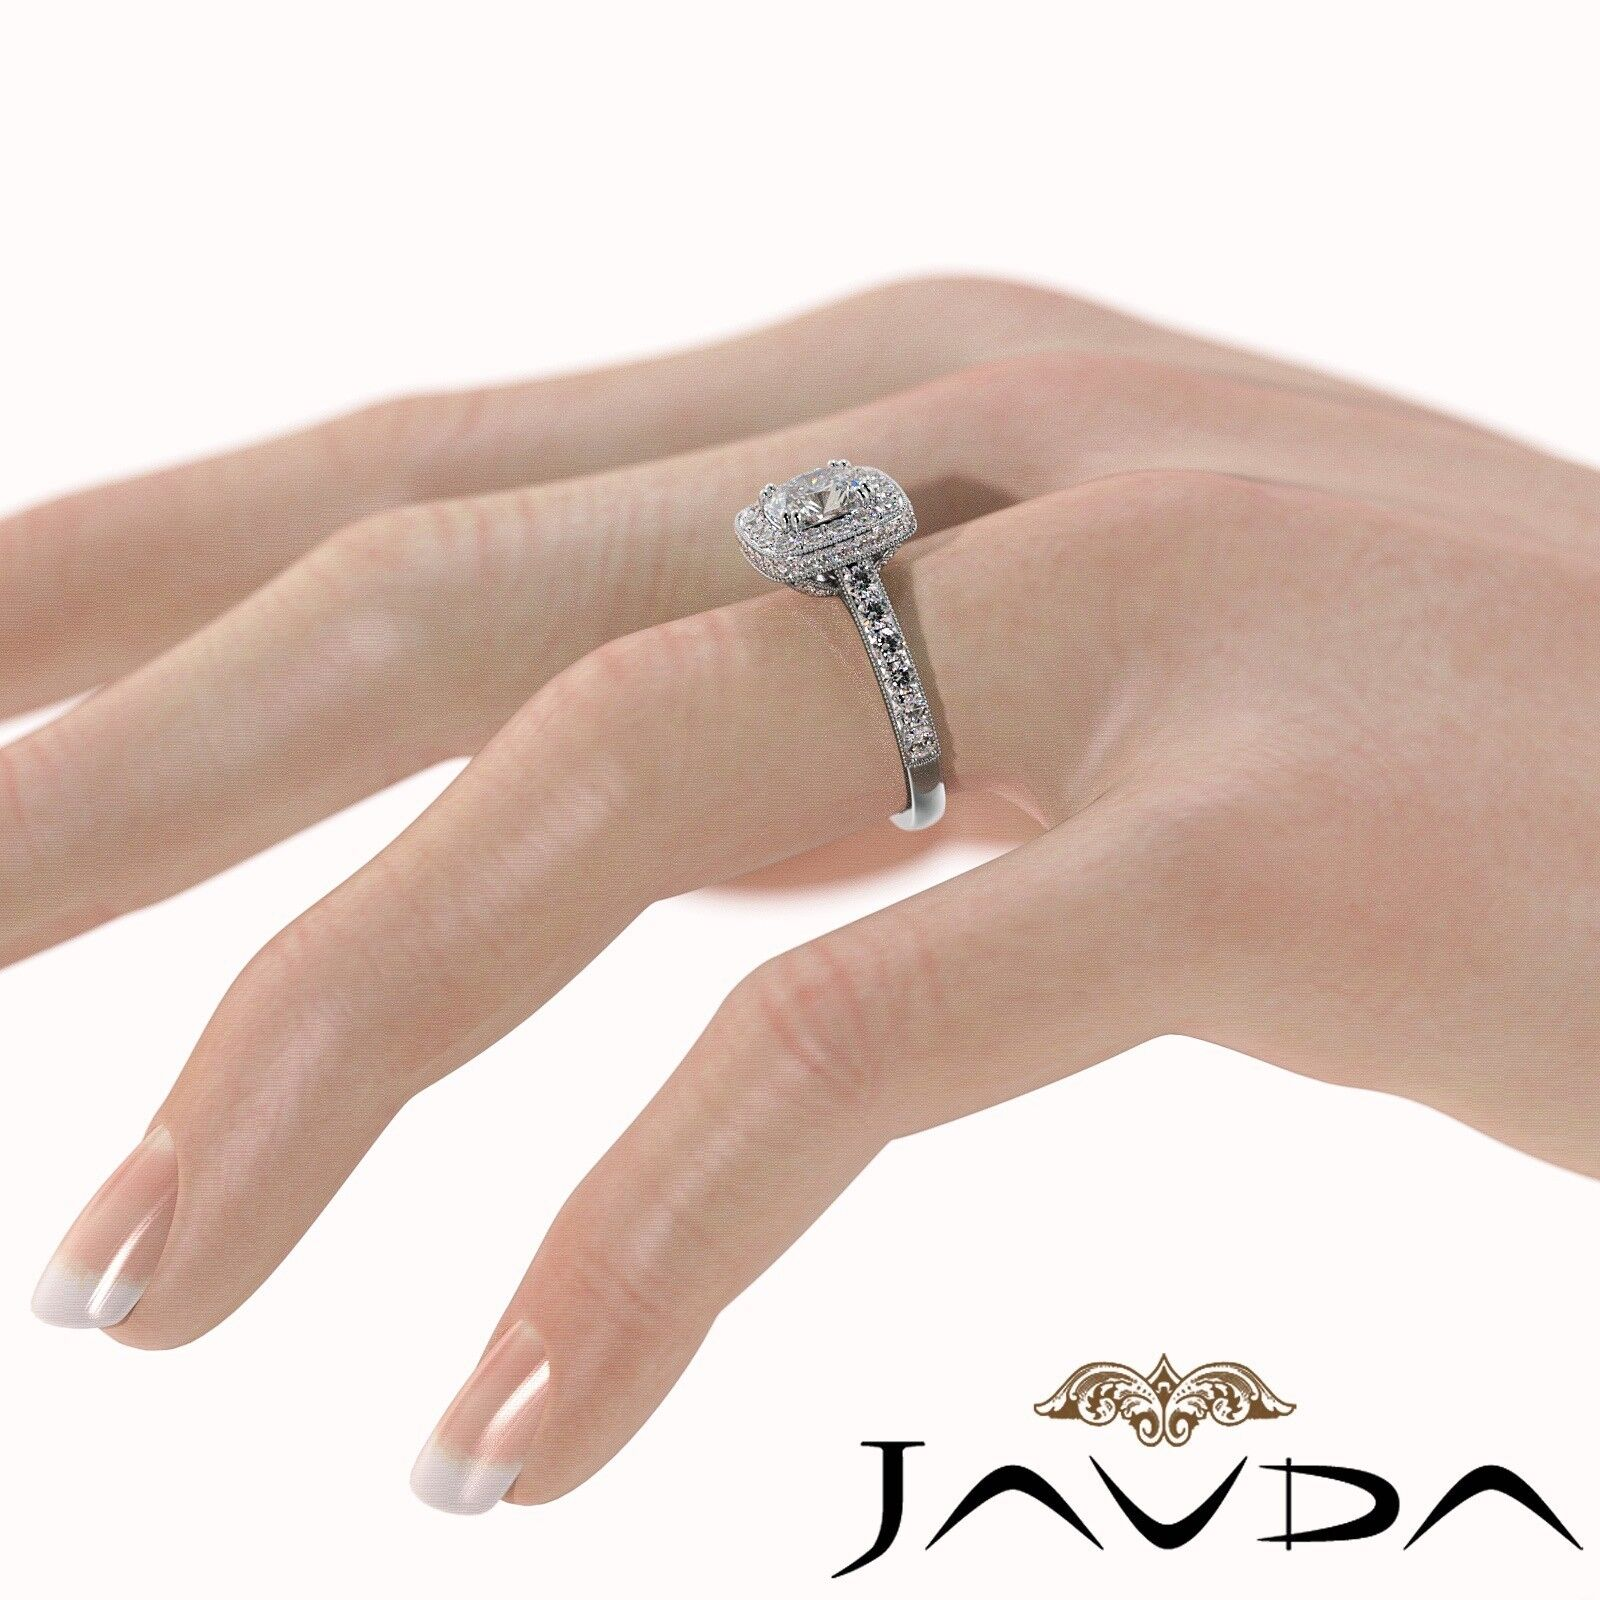 2.12ctw Milgrain Floral Basket Cushion Diamond Engagement Ring GIA I-SI2 W Gold 4